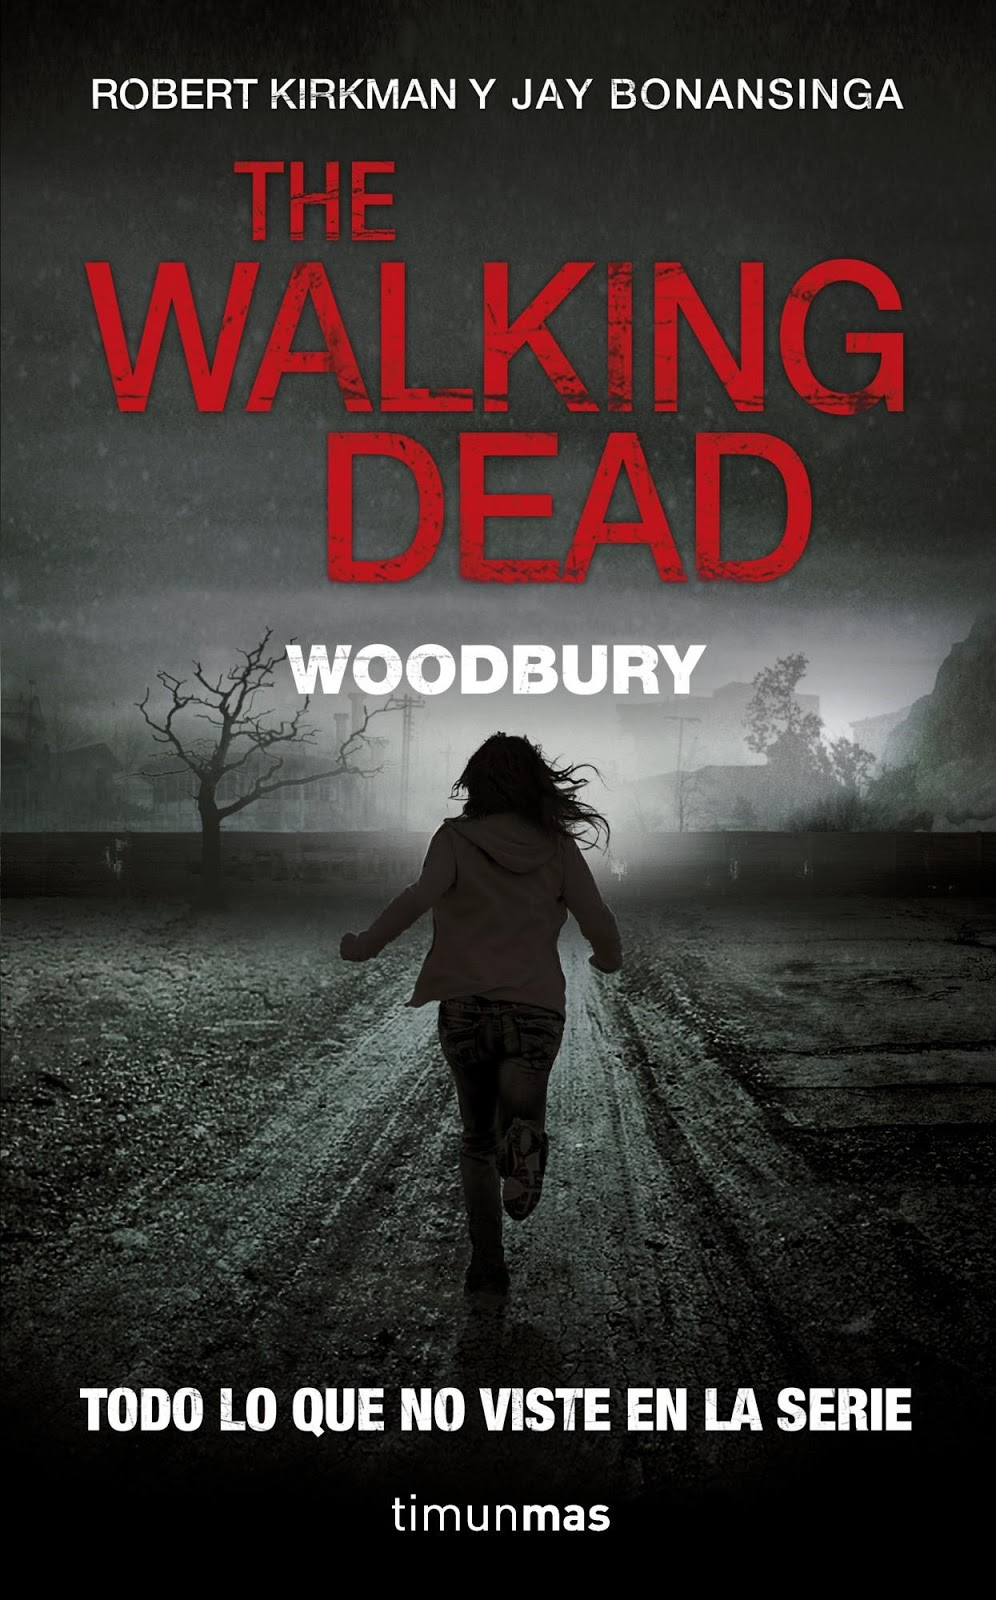 The Walking Dead: Woodbury (La Novela) [Reseña]